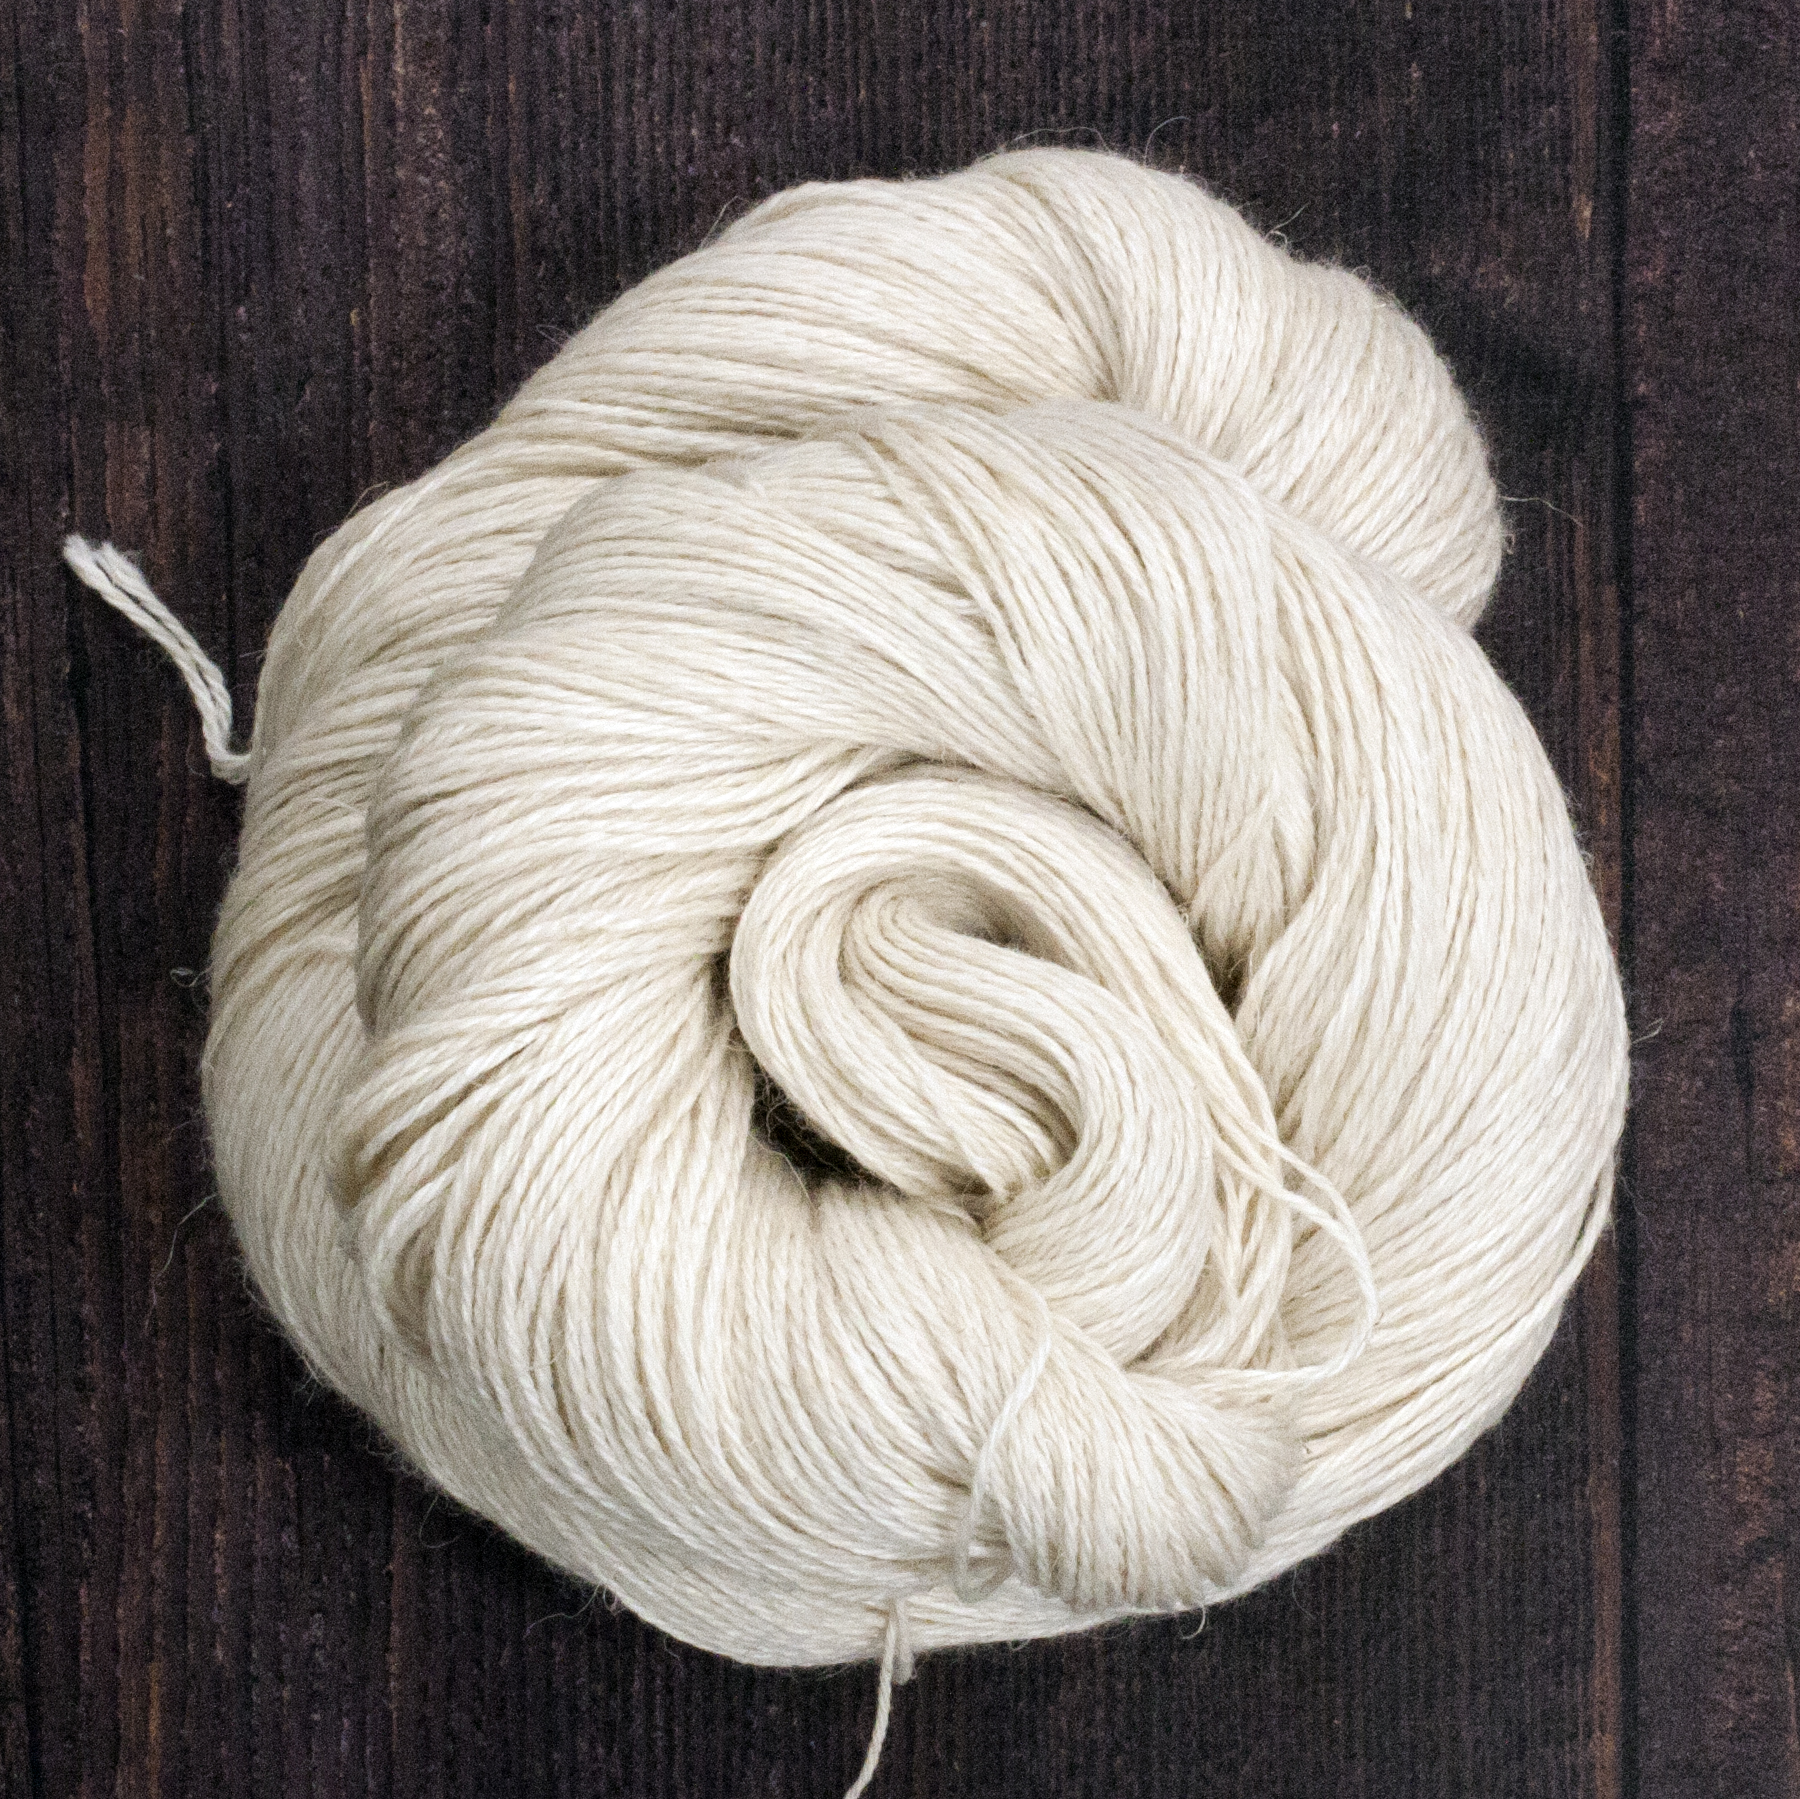 Type 49160   Eygptian 4ply  50% Baby Alpaca  25% Linen  25% Silk  100g Hanks   400m per 100g 3/12nm